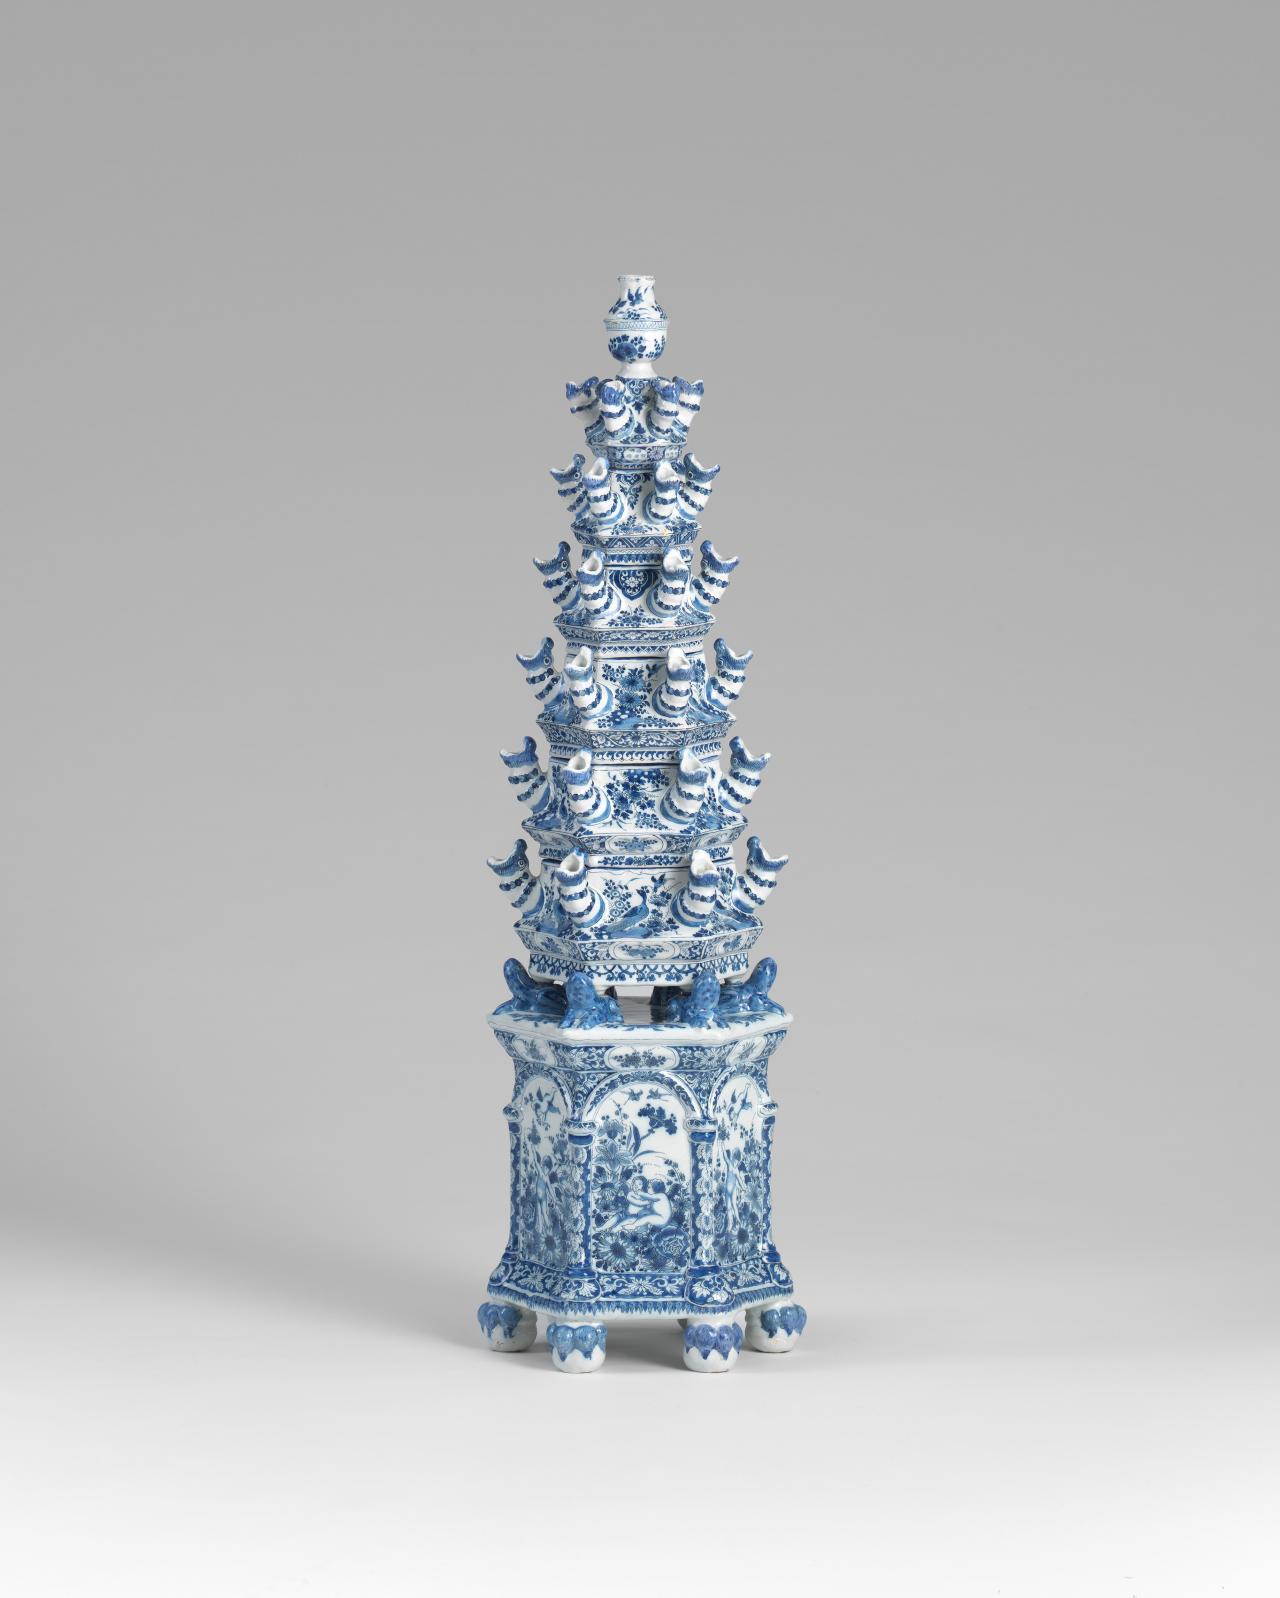 The pyramidal flower vase c 1690 ngv de grieksche a pottery adriaen kocx the greek a pottery delft reviewsmspy